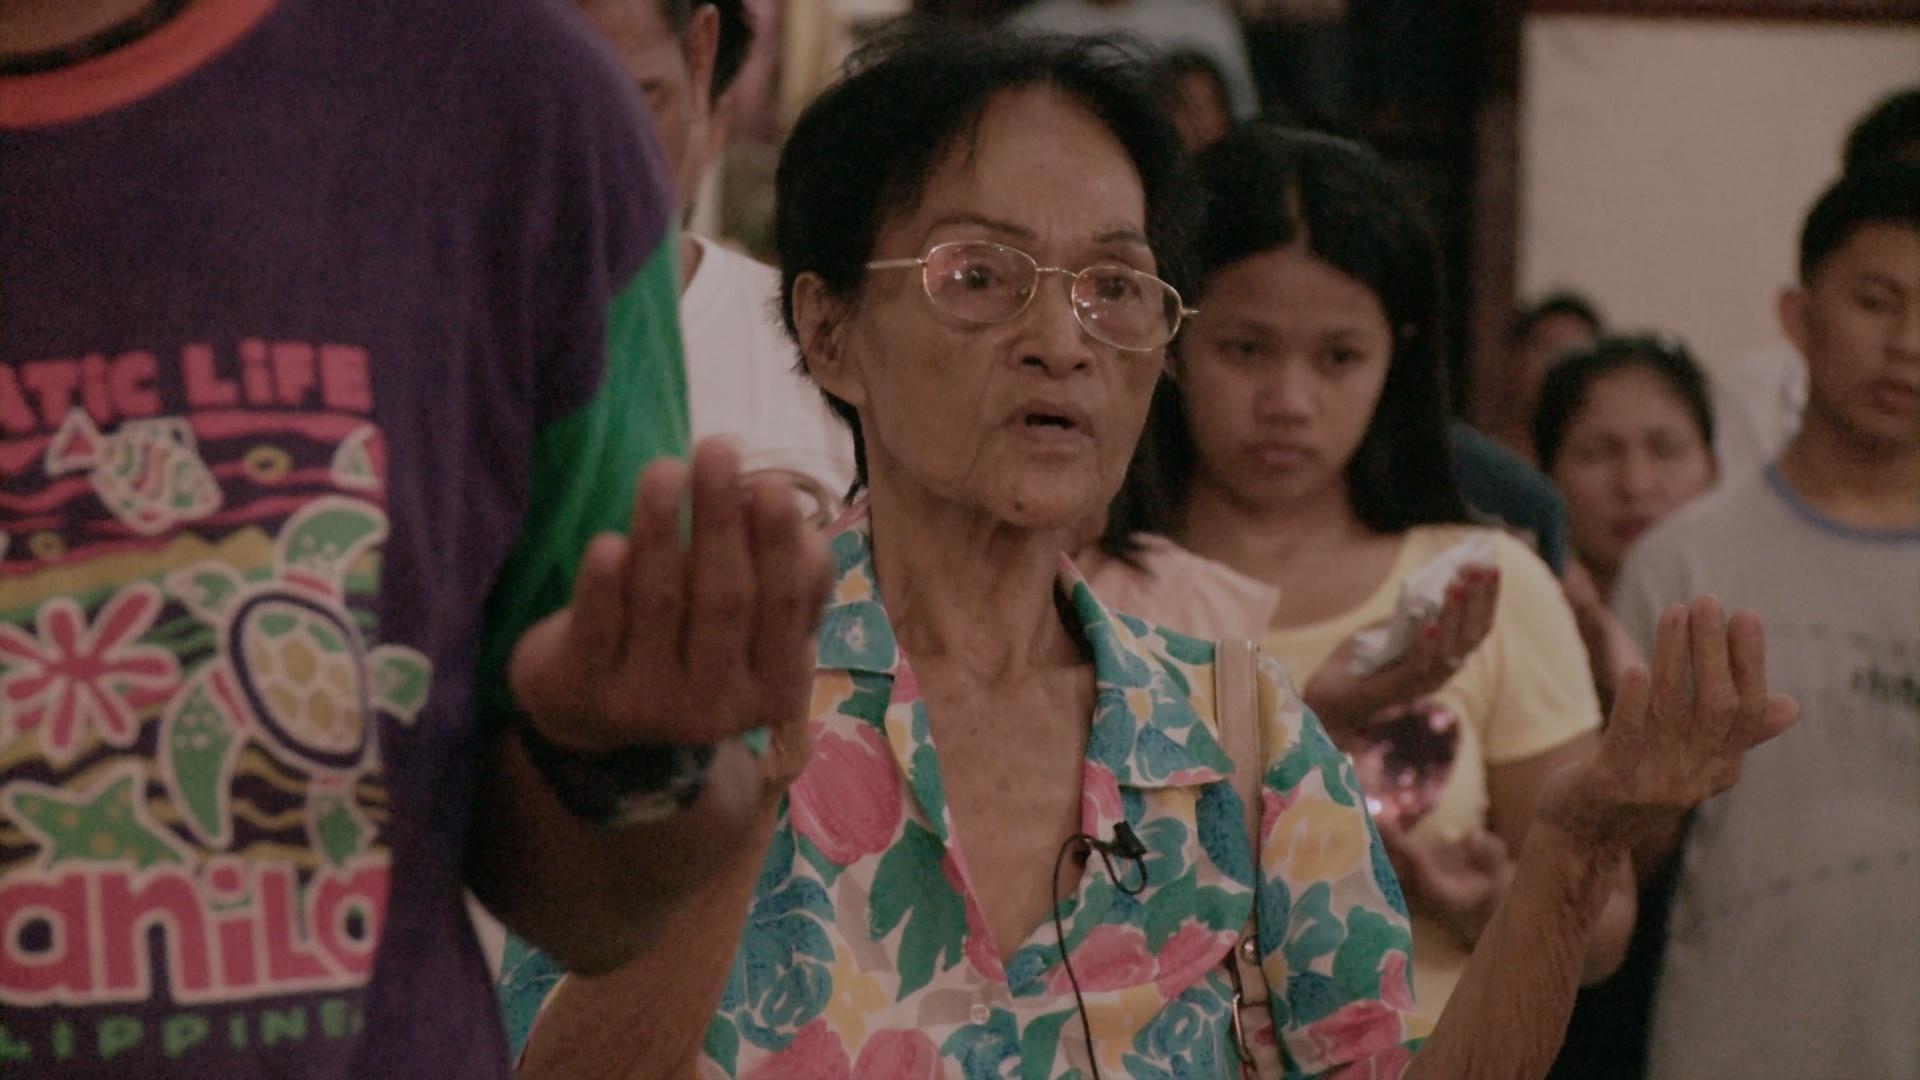 The Apology - Meeting Grandma Adela